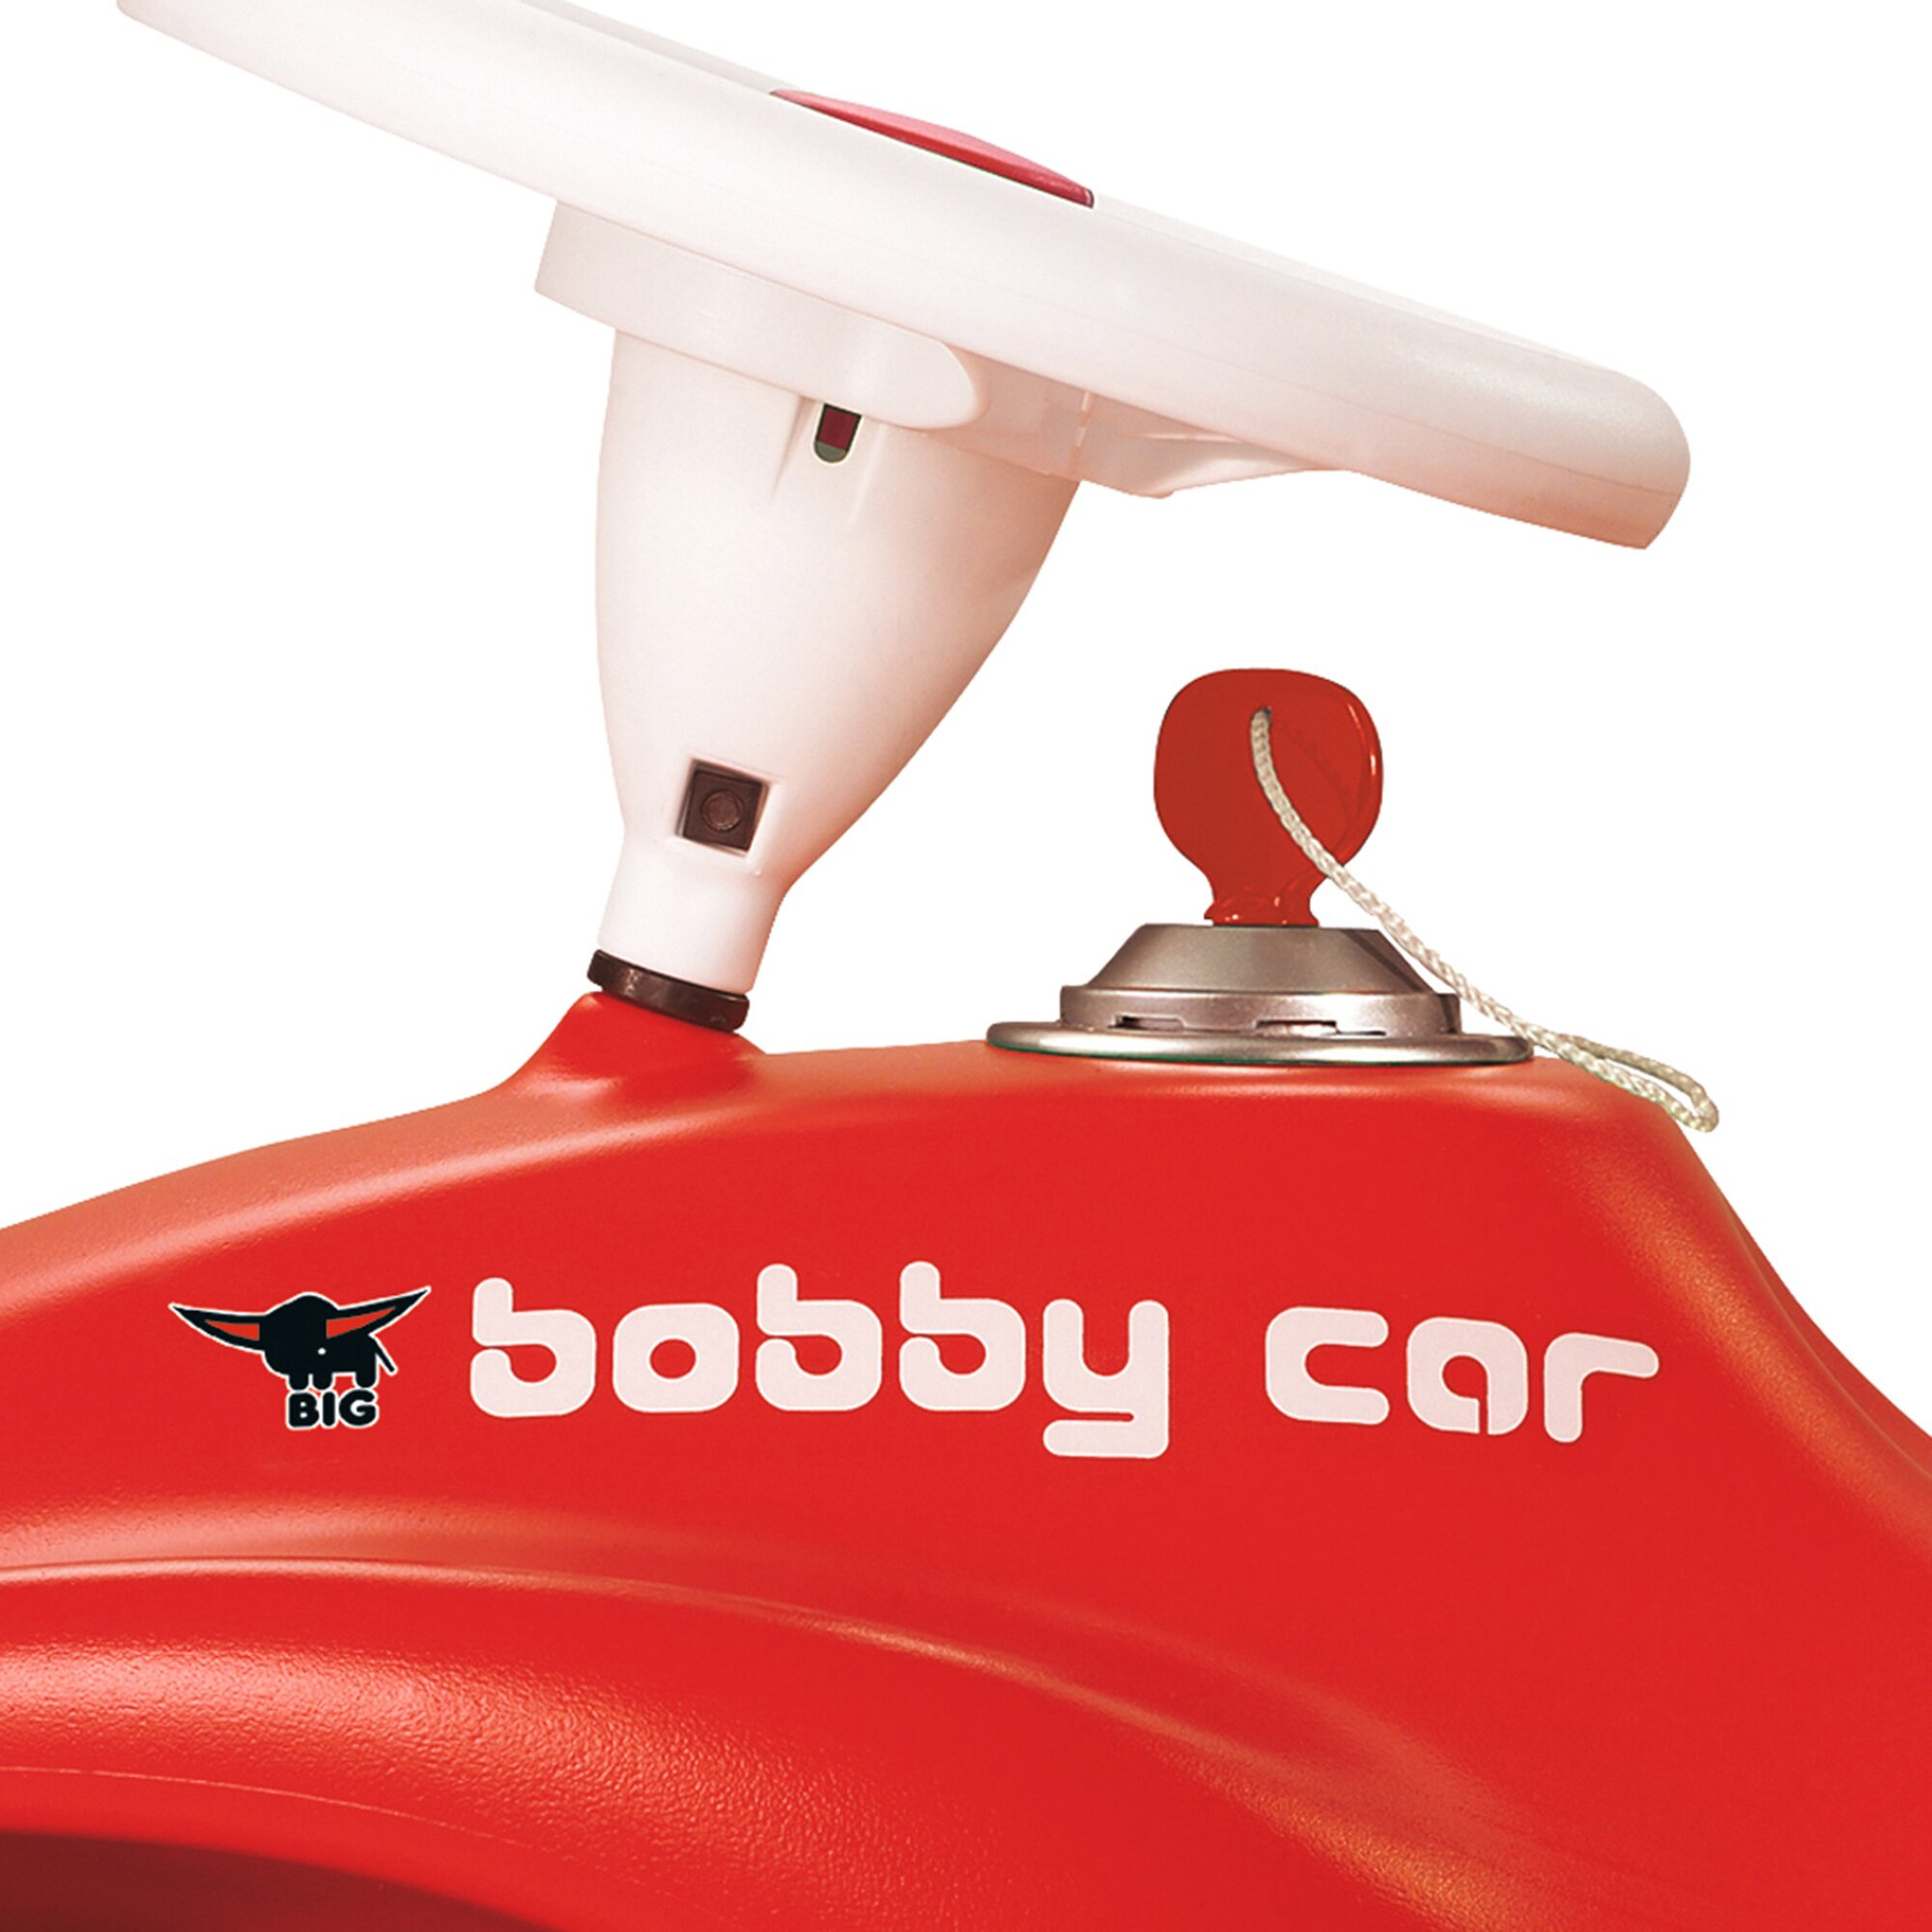 big-sound-starter-fur-new-big-bobby-car